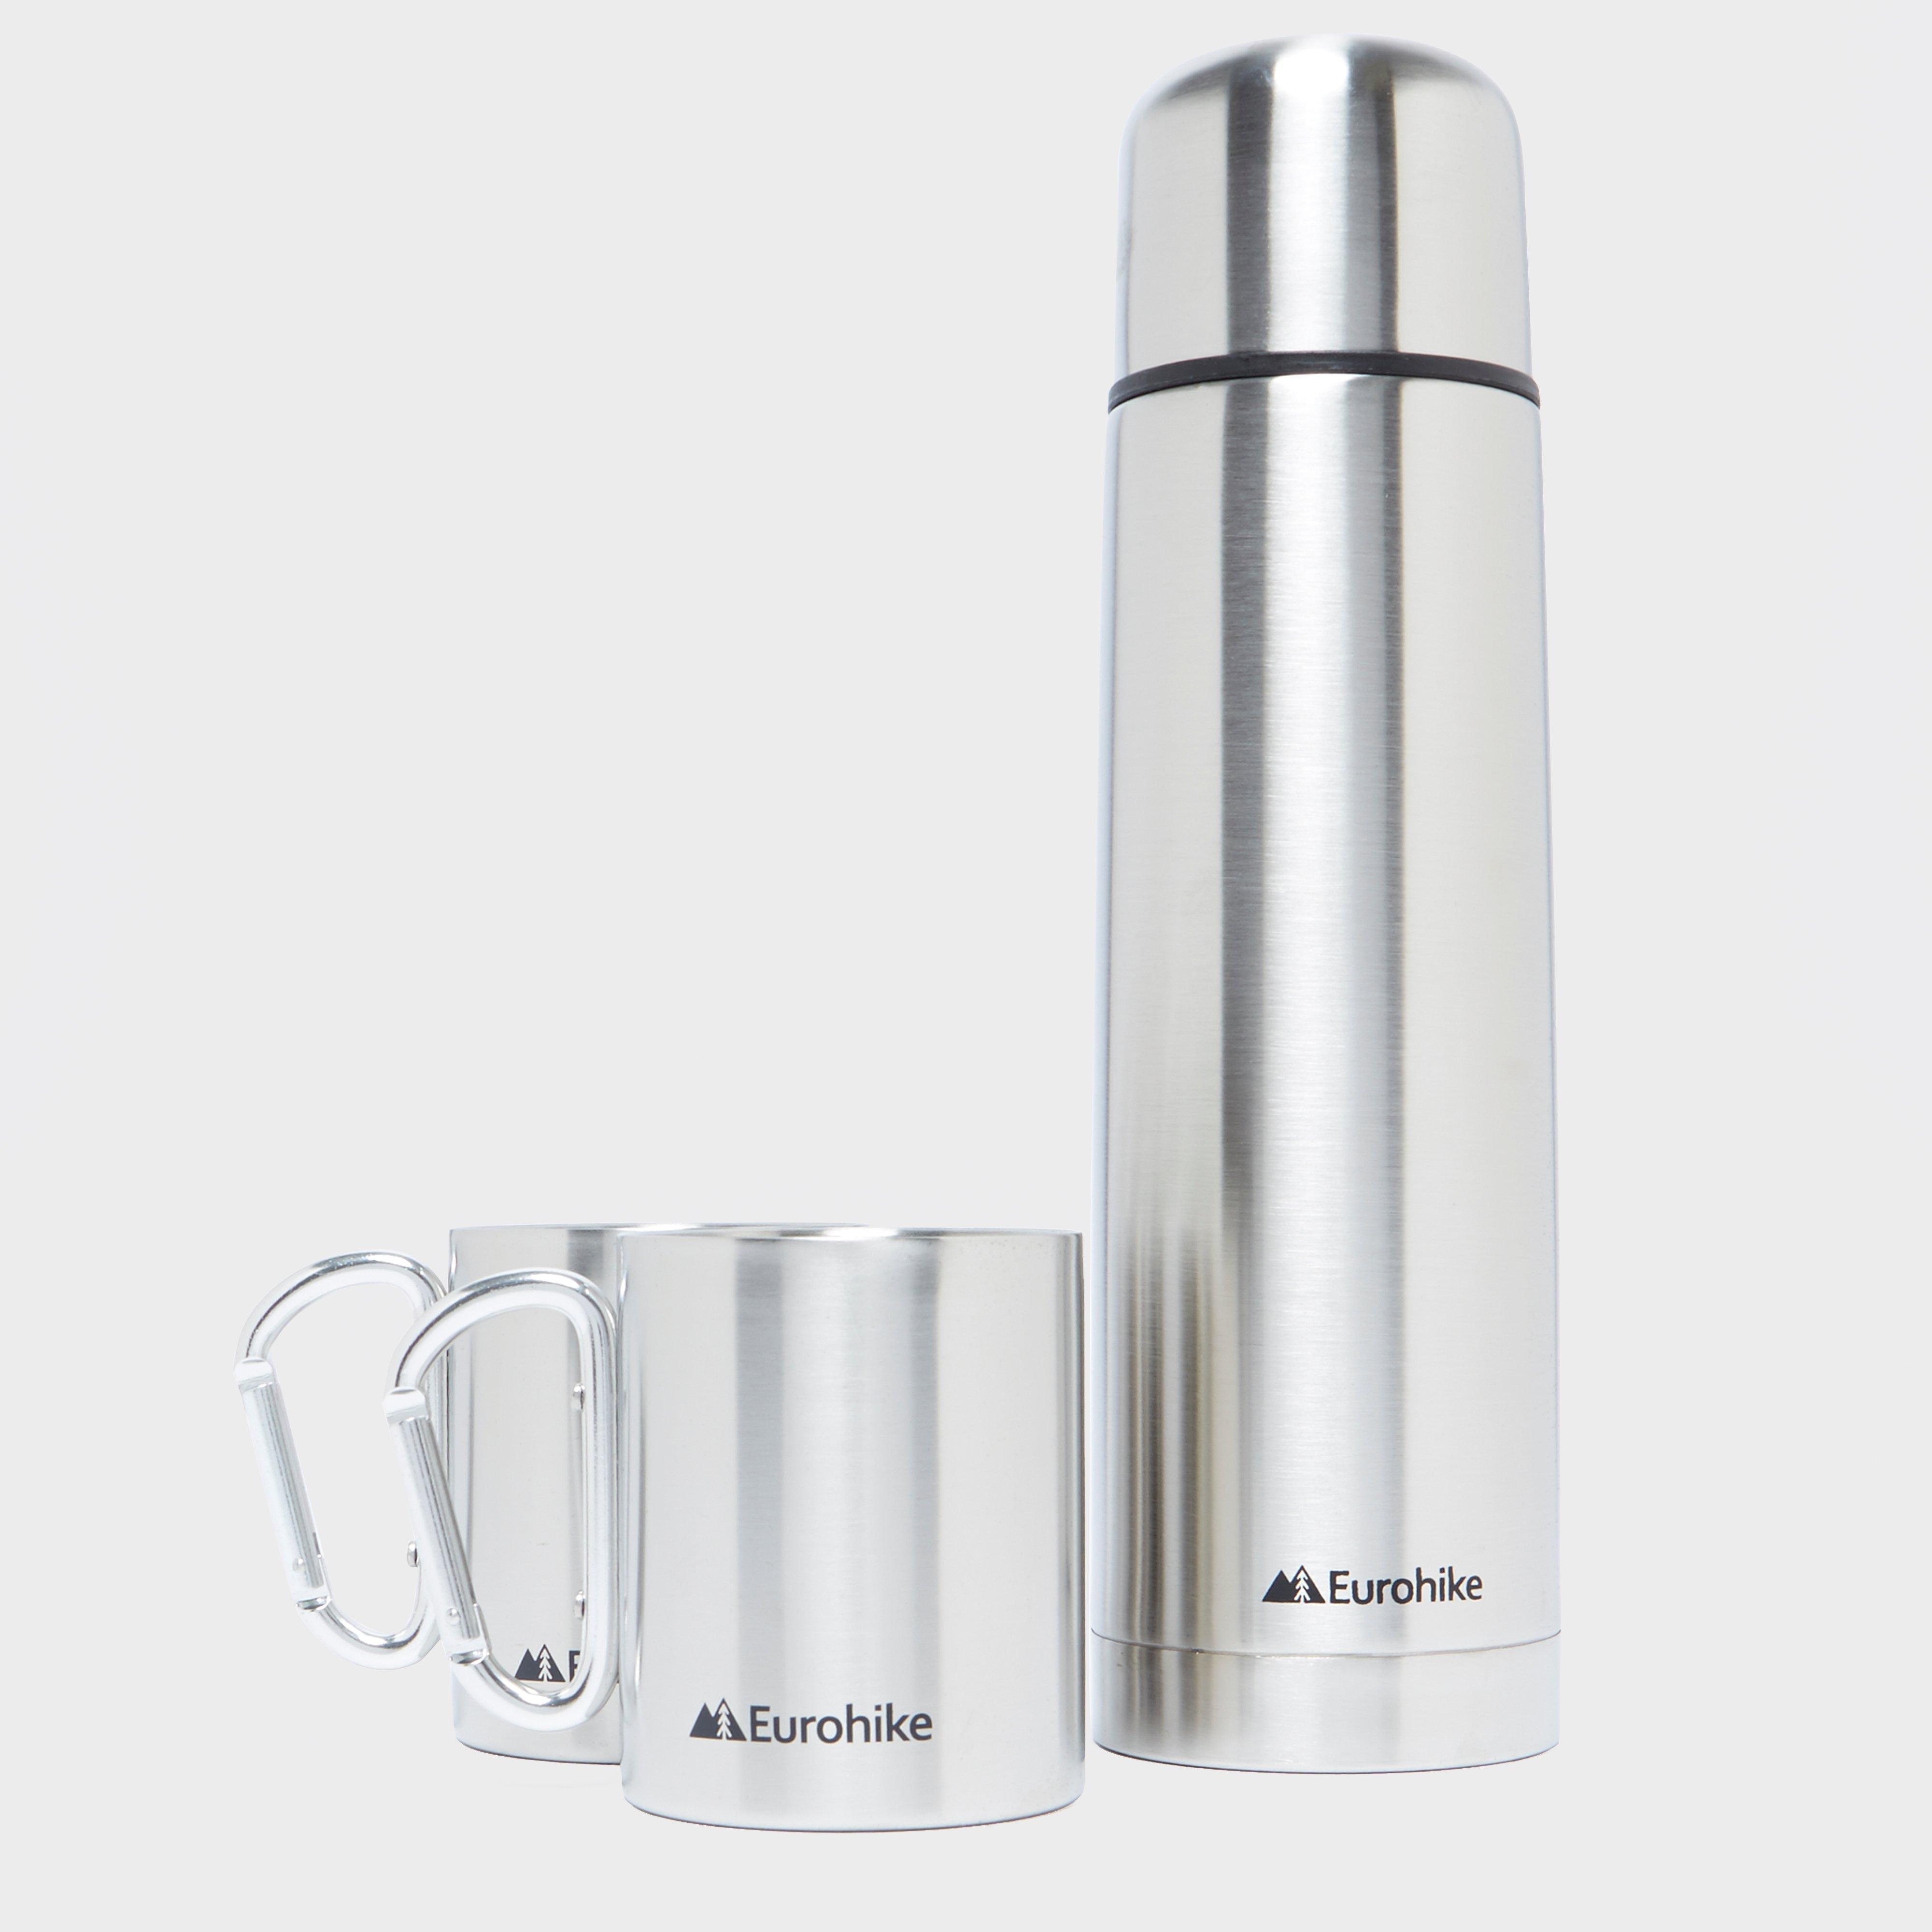 Eurohike Eurohike 750ml Flask + 2 Karabiner Mugs - Silver, Silver